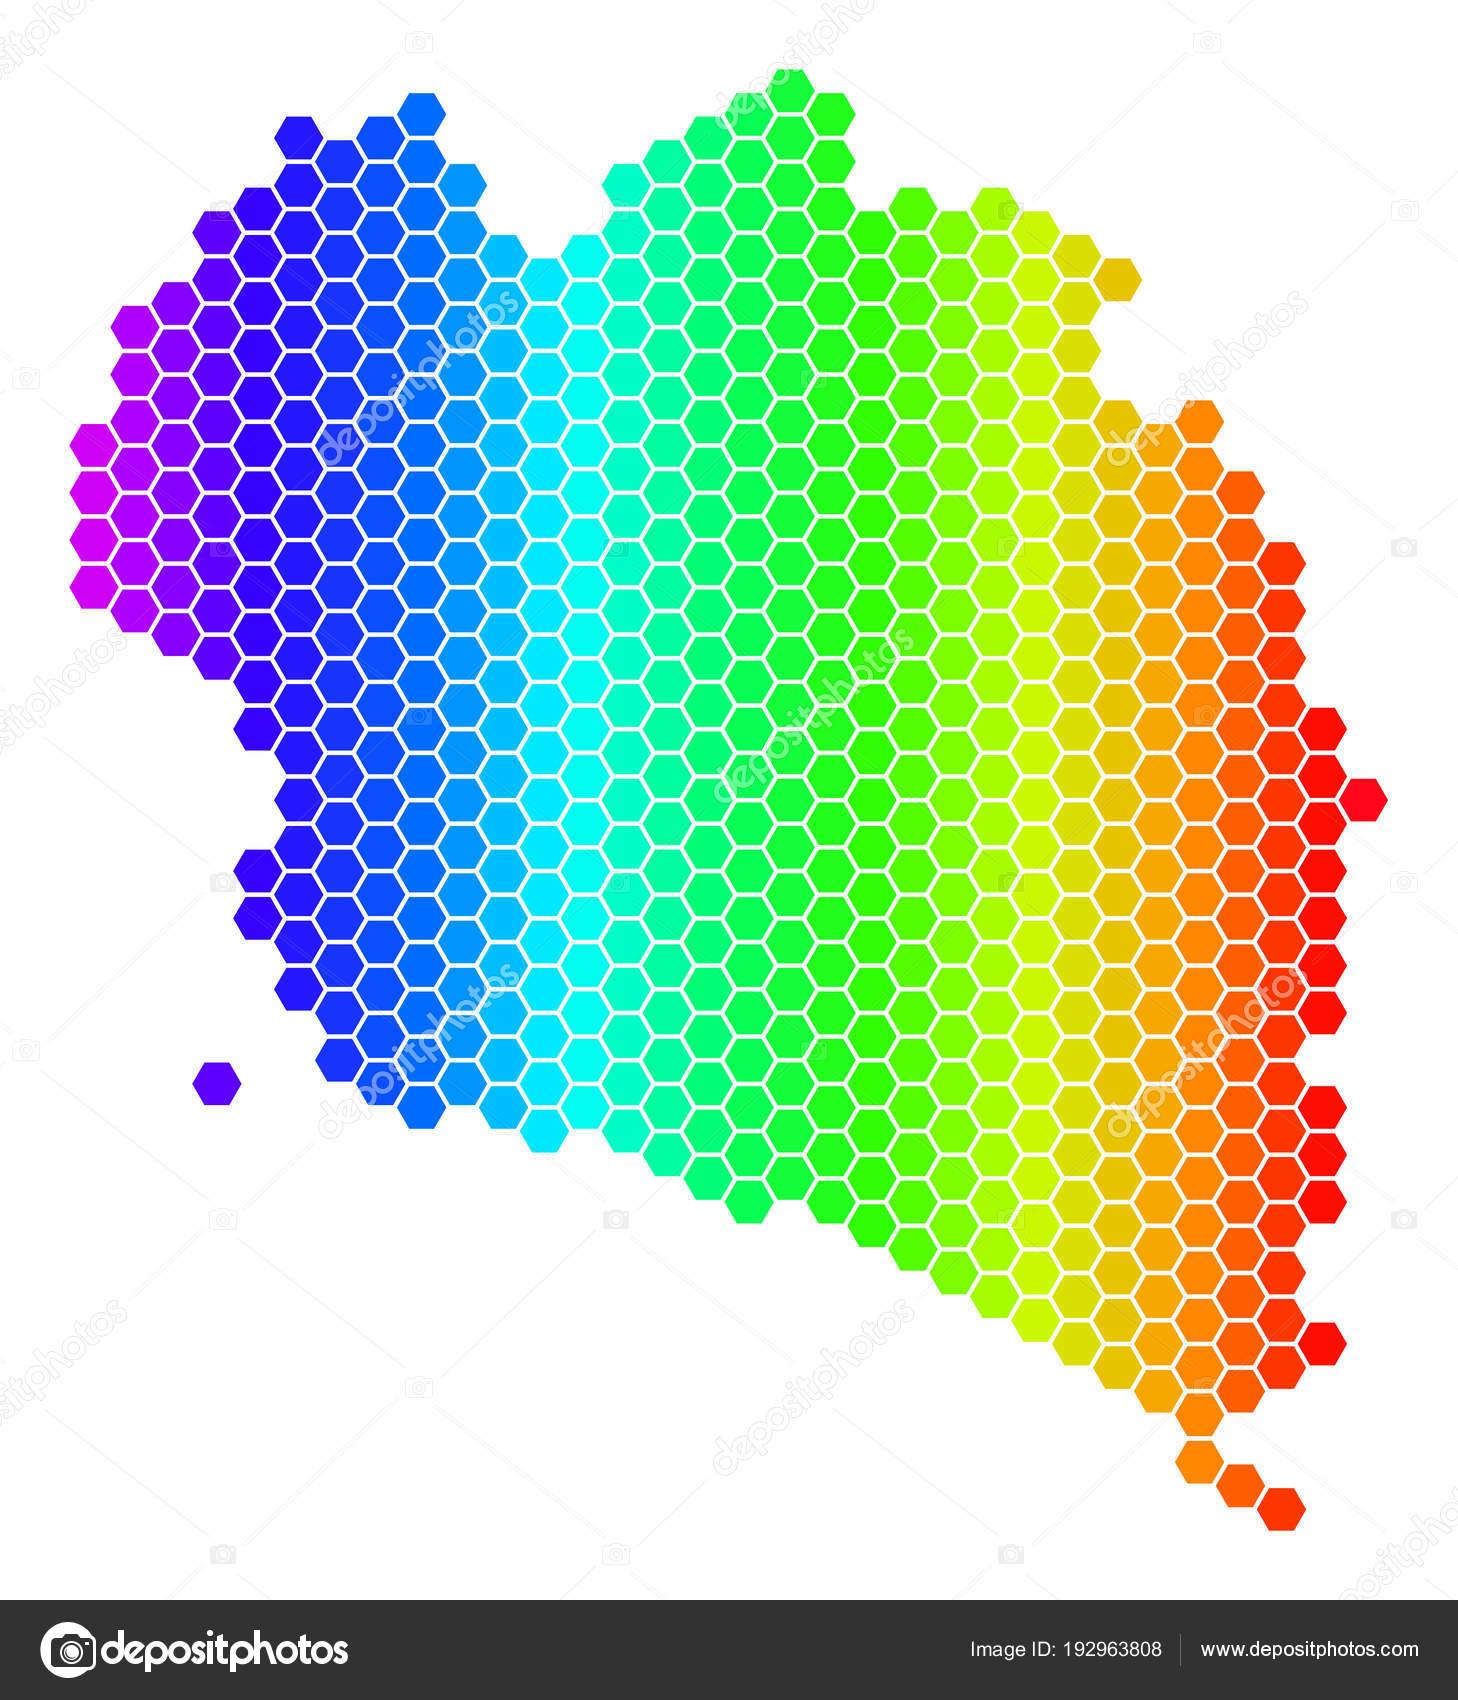 Koh Phangan Thailand Map.Spectrum Hexagon Koh Phangan Thai Island Map Stock Vector